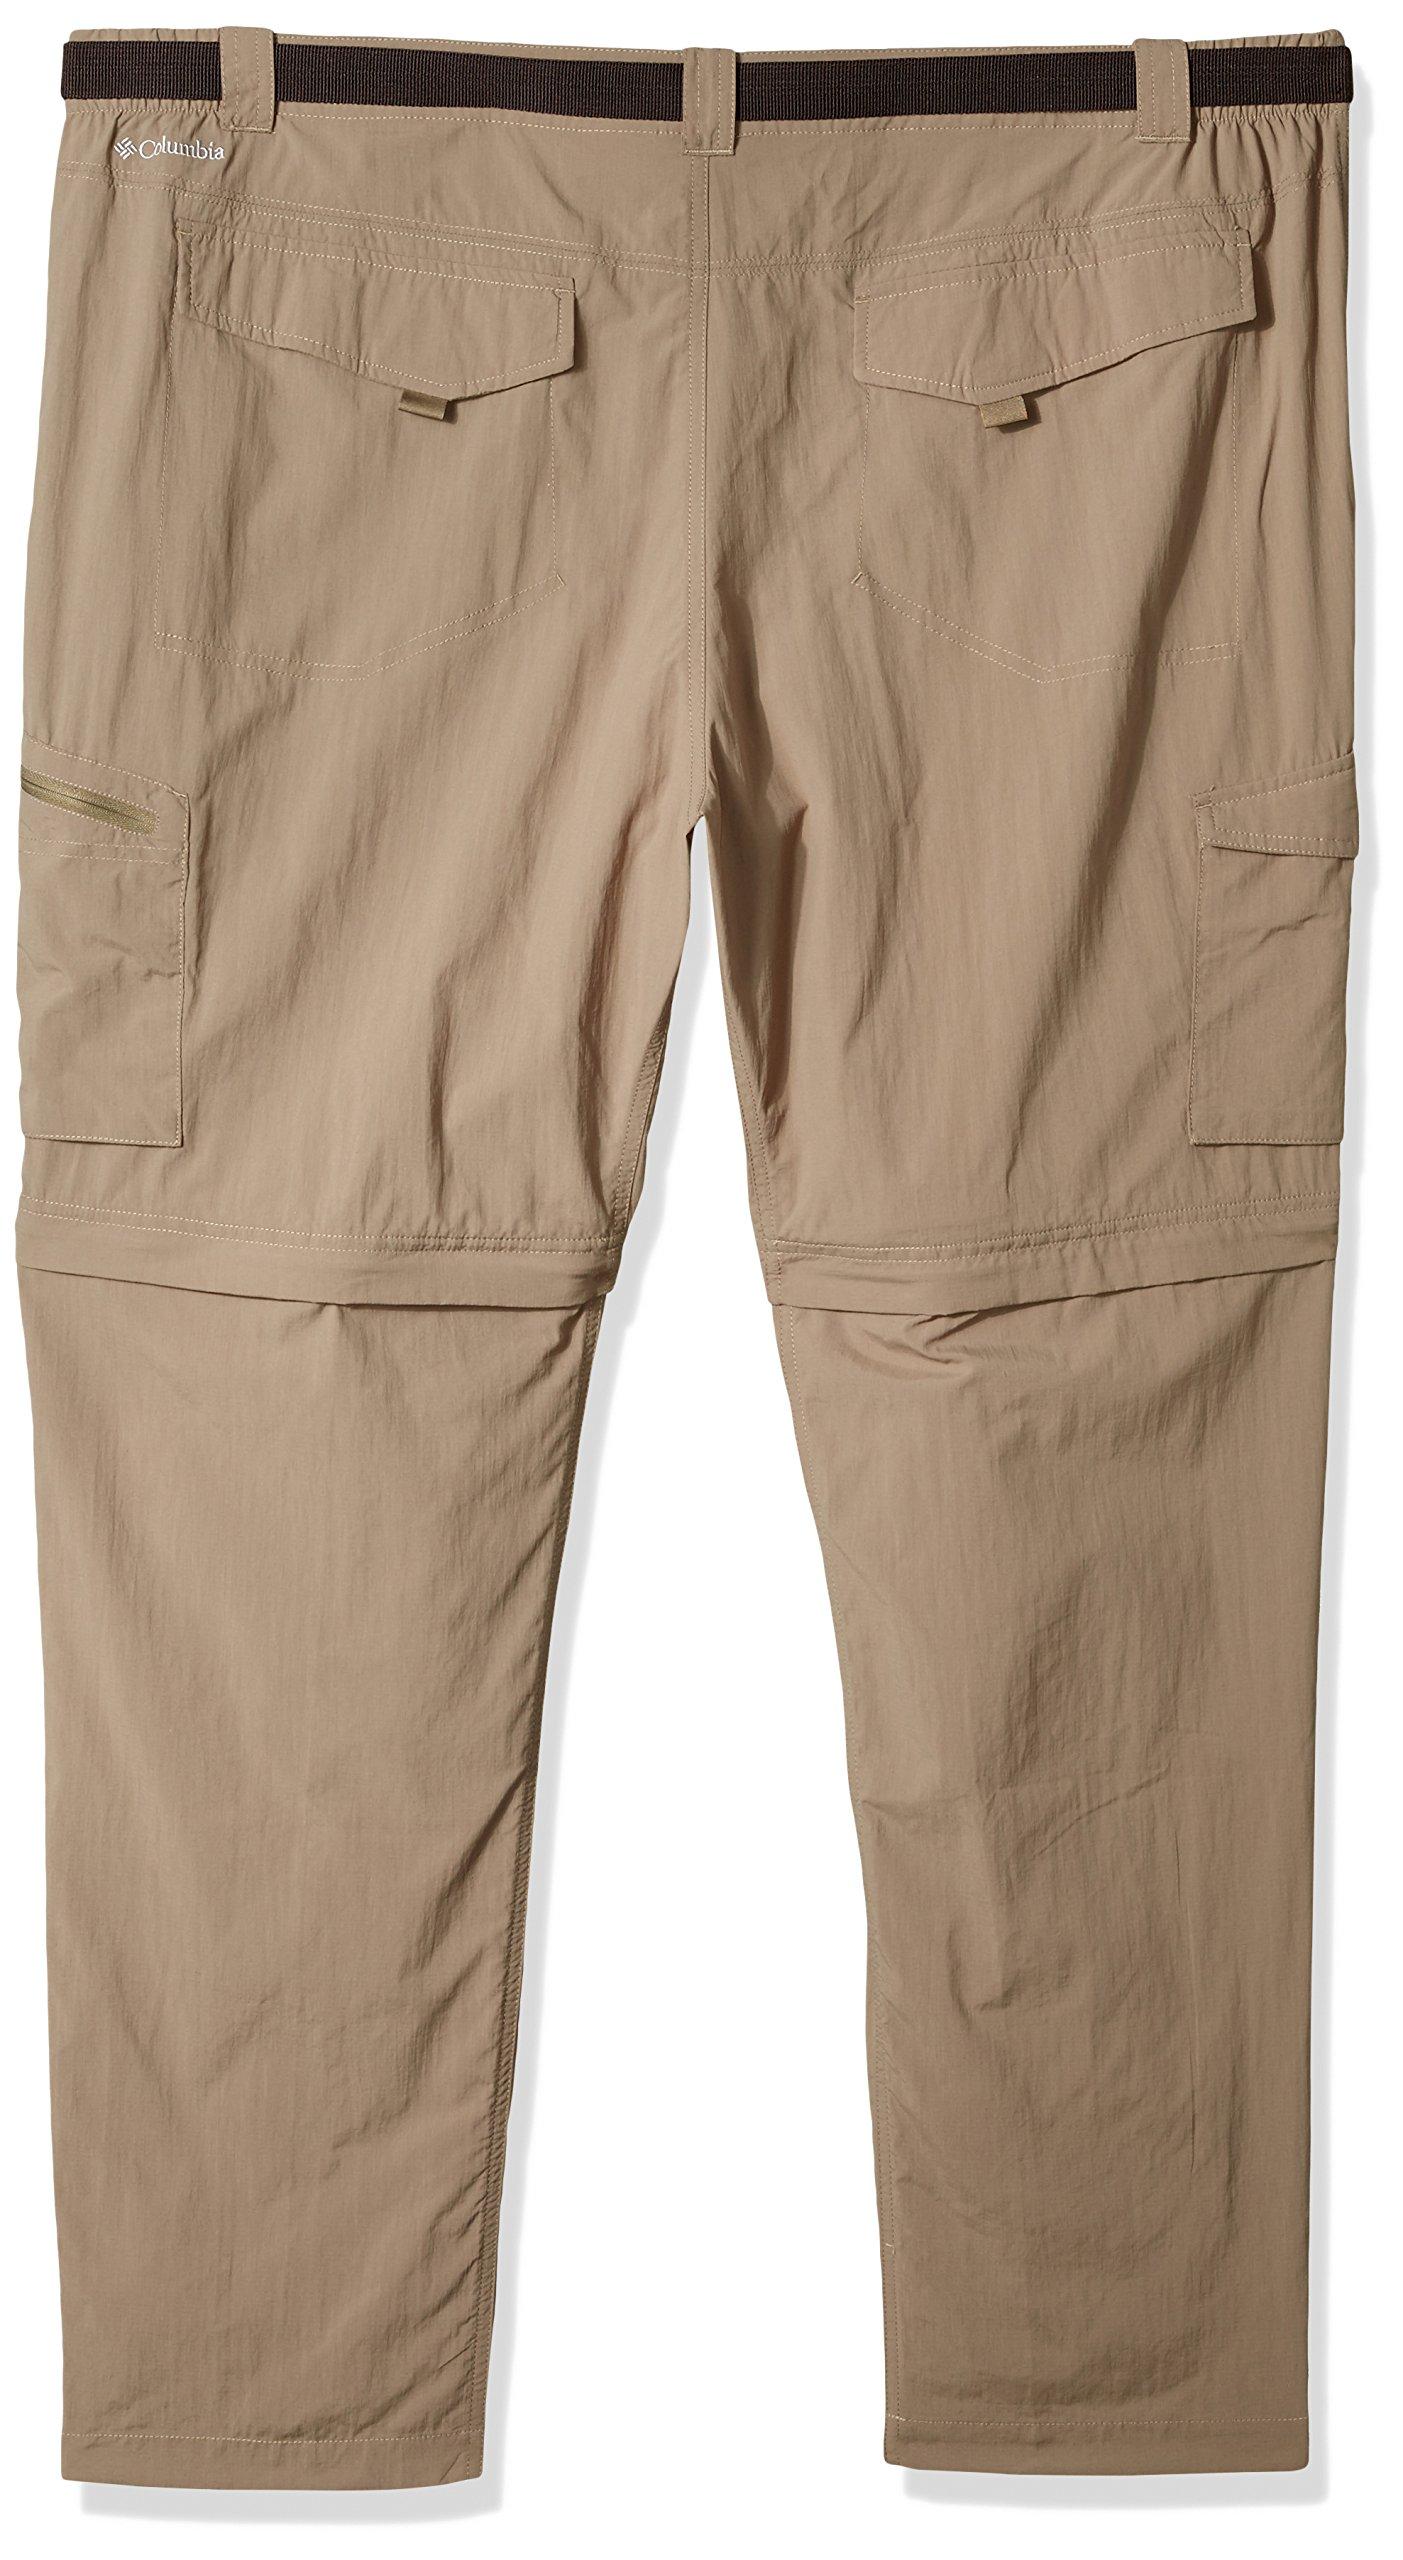 Columbia Men's Silver Ridge Big & Tall Convertible Pants, Sage, 44 x 34 by Columbia (Image #2)